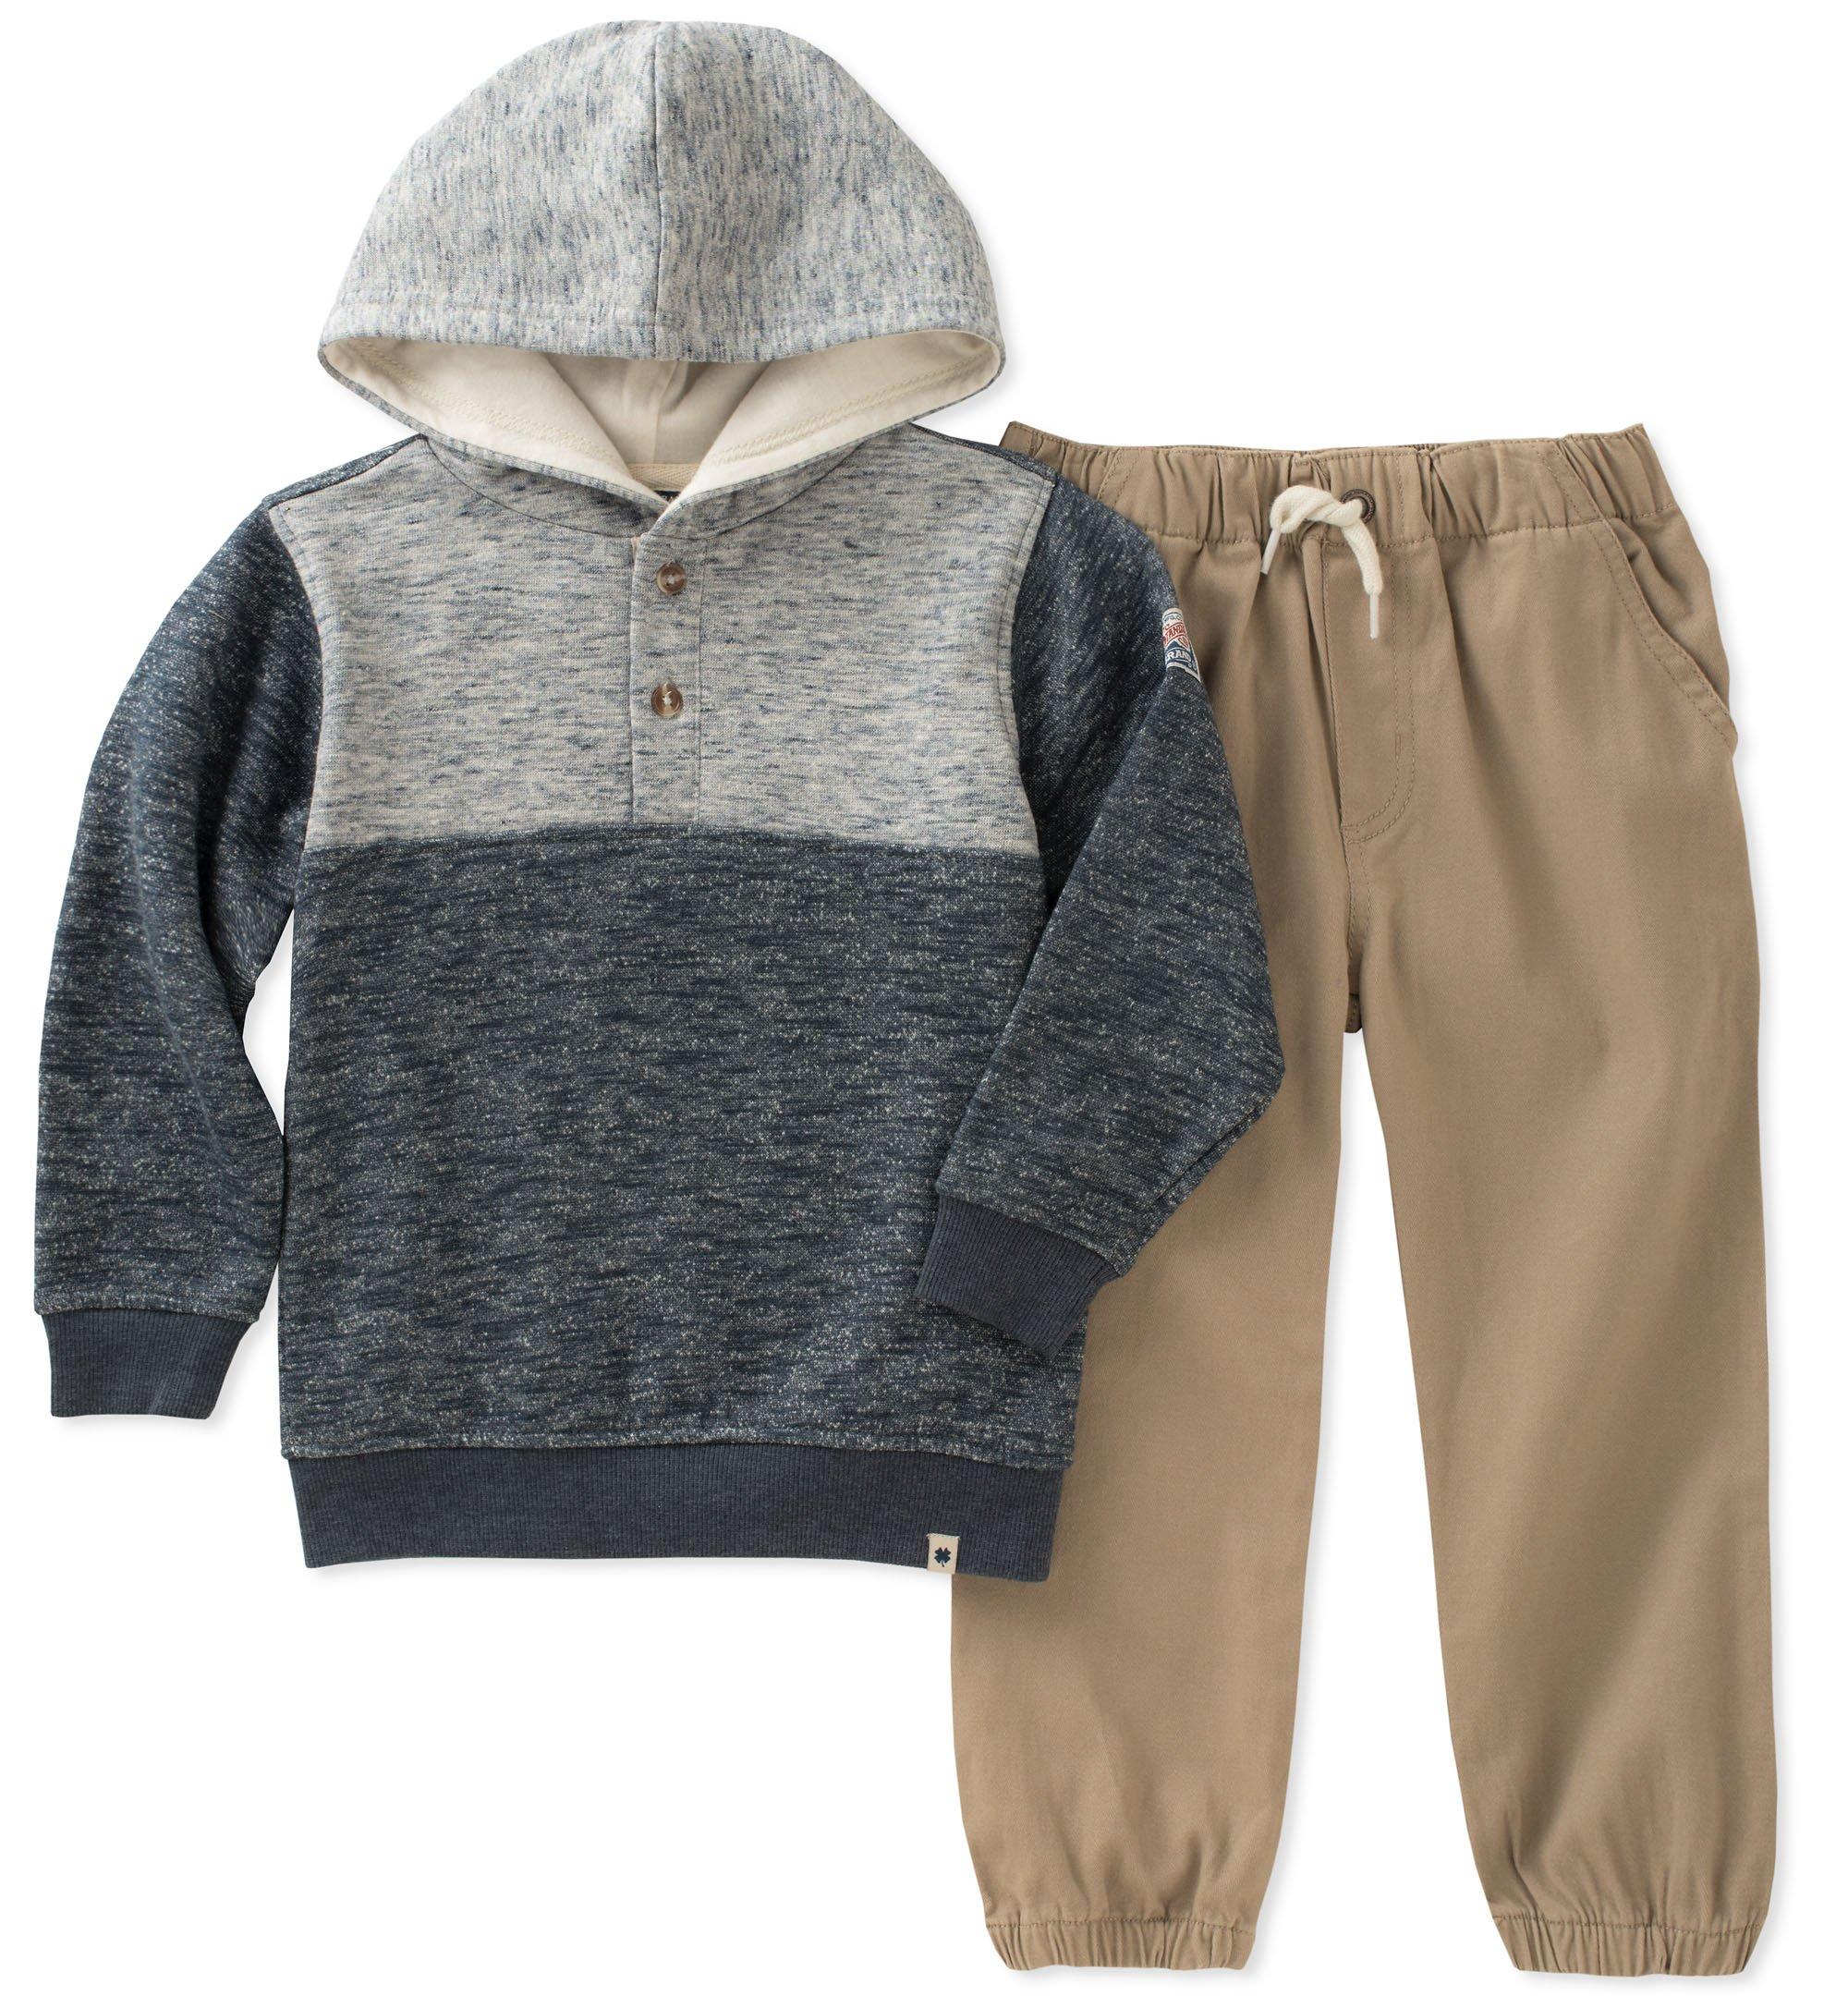 Lucky Brand Little Boys' Pant Set, Light Blue Marle/Dark Blue Marle/Silver Mink, 6